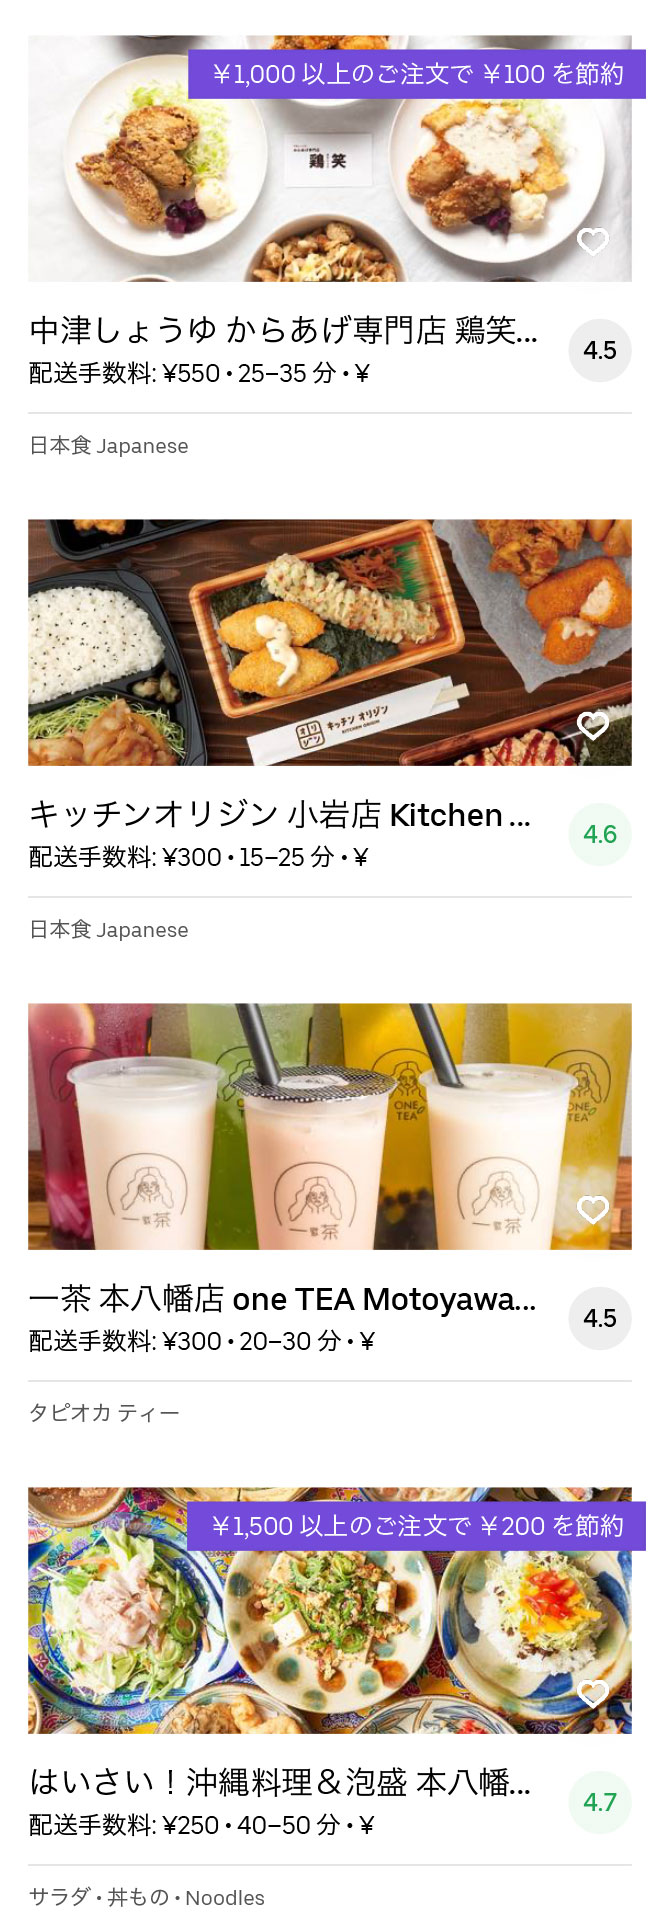 Ichikawa menu 2004 11